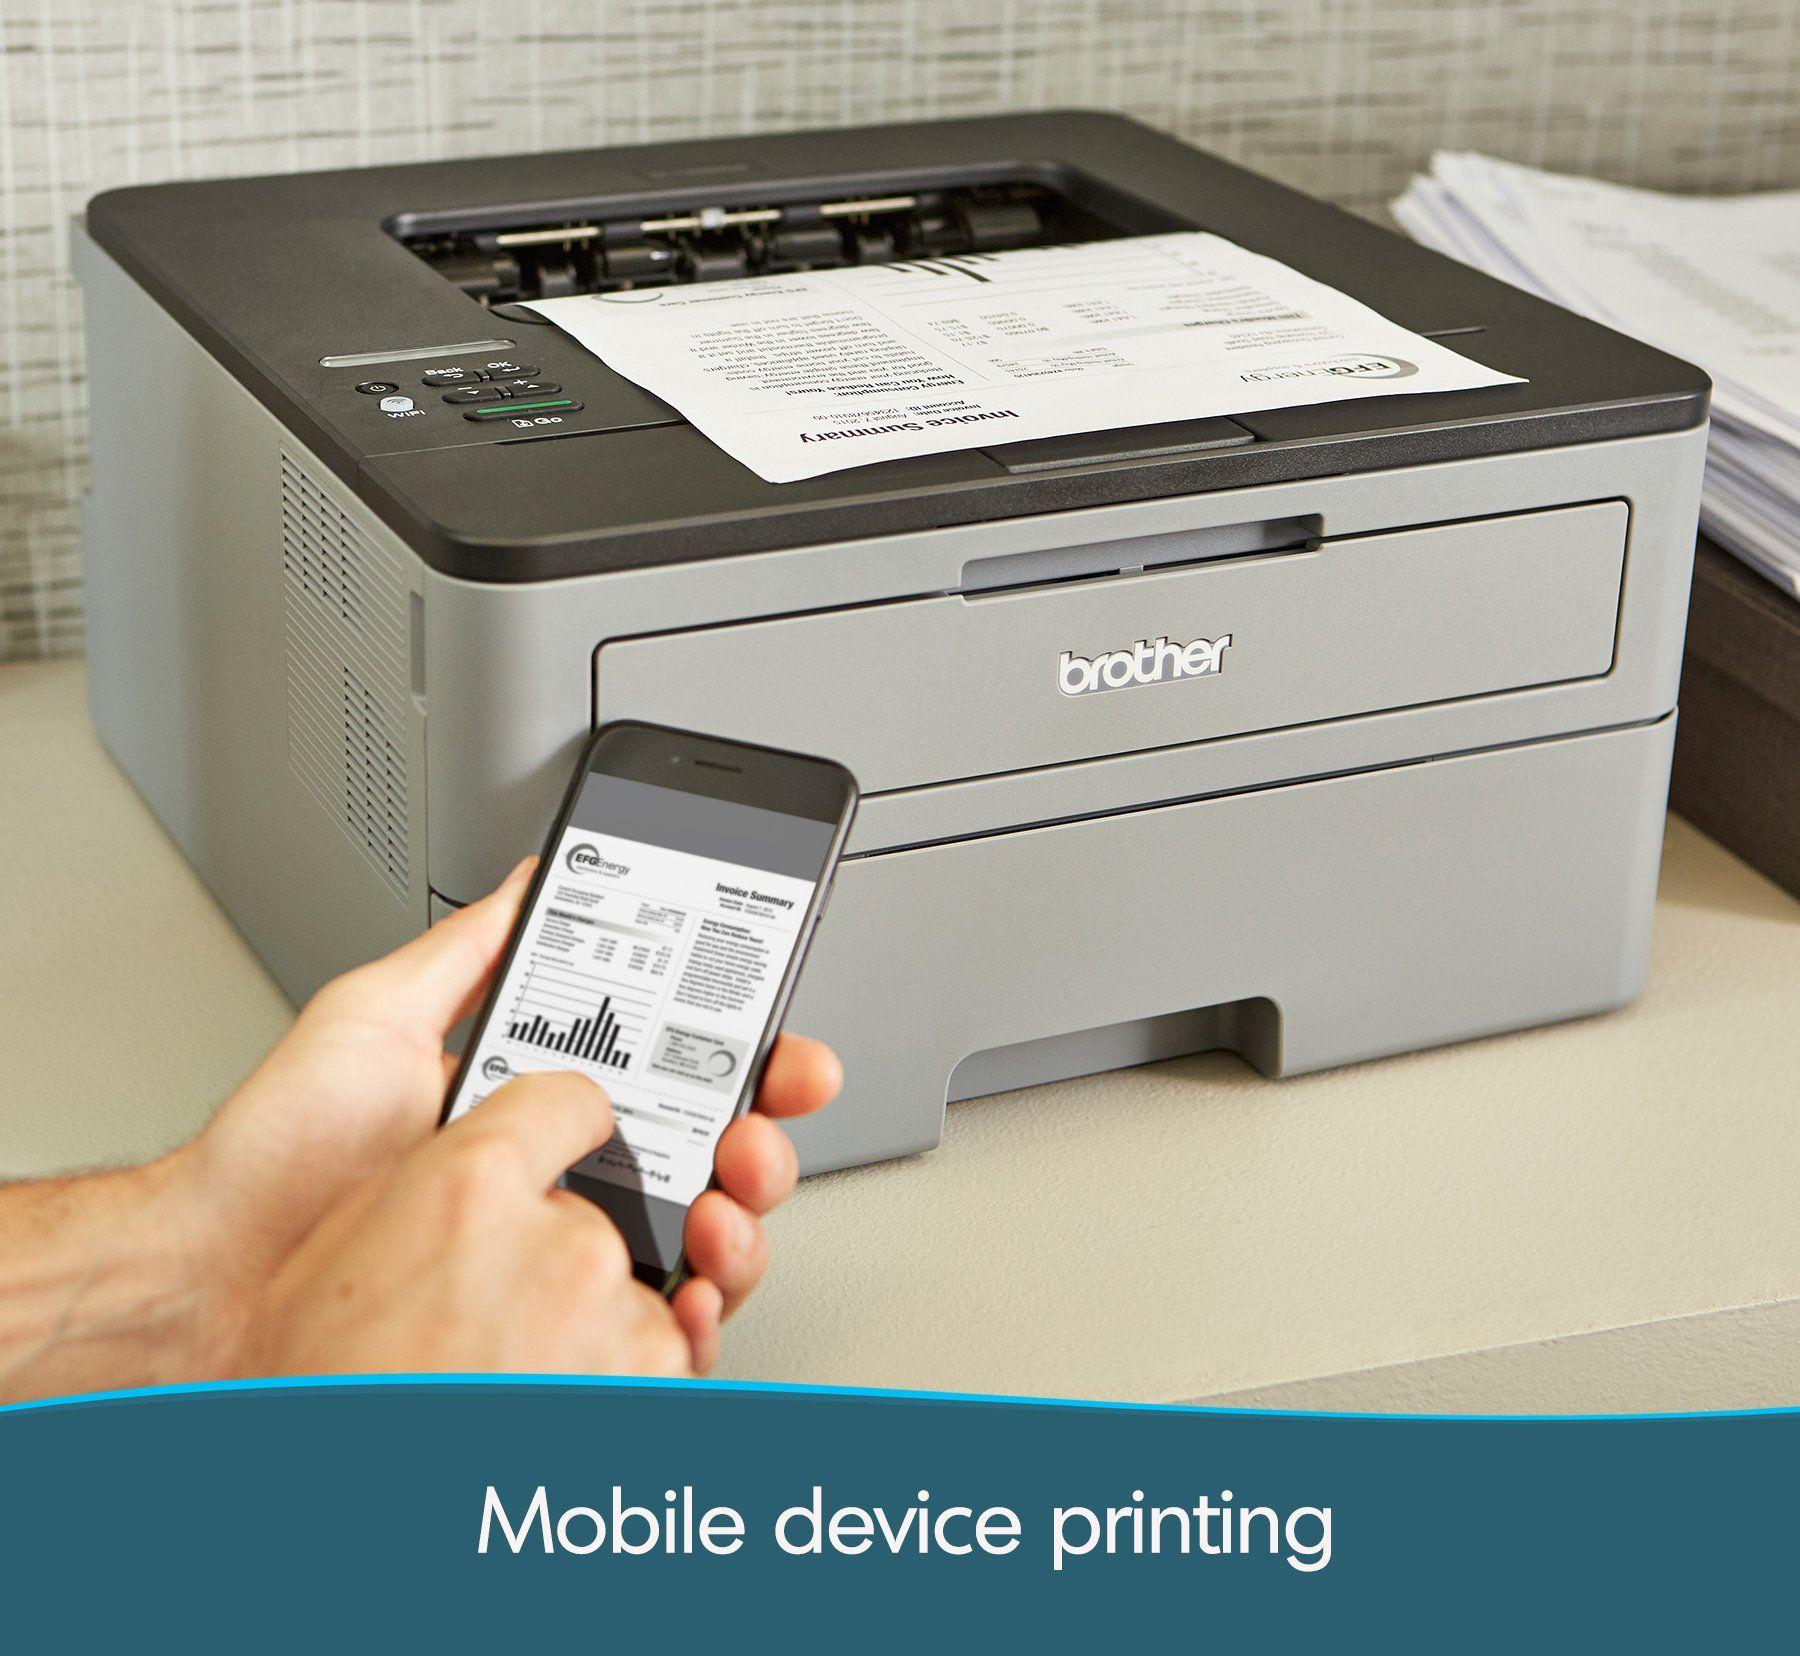 Brother Compact Monochrome Laser Printer Hll2350dw Wireless Printing Duplex Twosided Printing Amazon Dash Replenishment Laser Printer Printer Wireless Printer